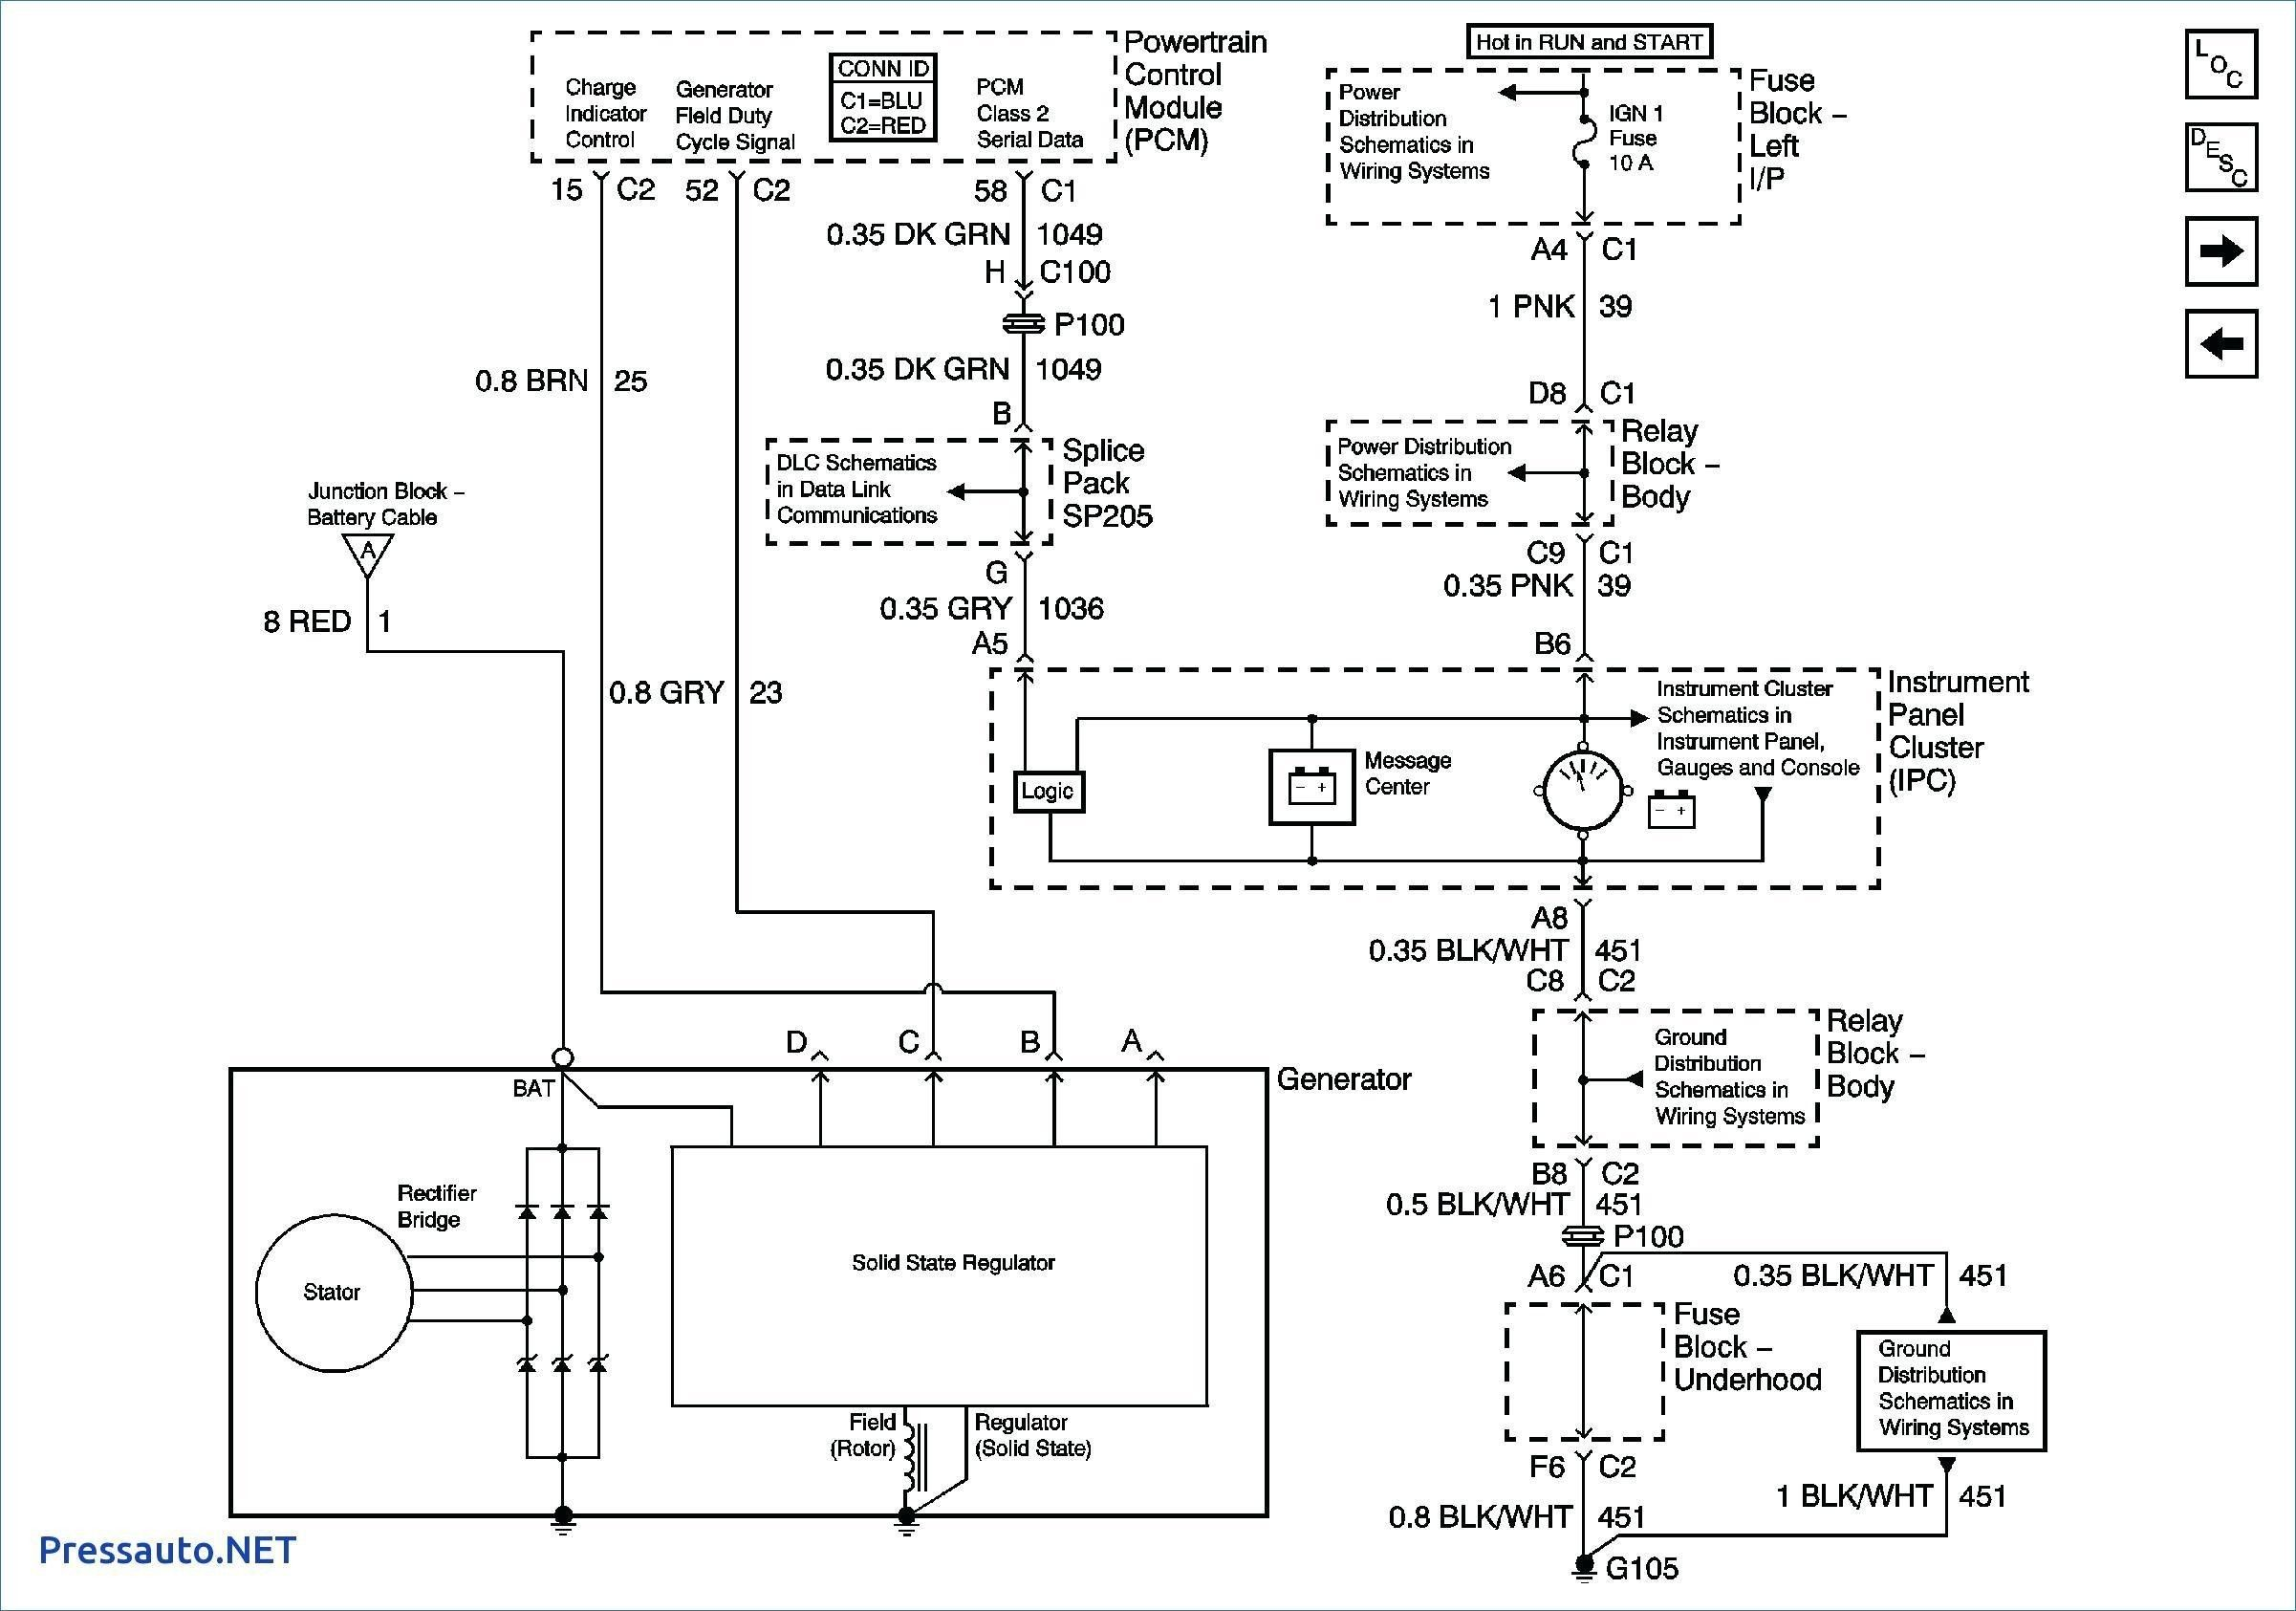 Wiring Diagram For Unique In 2020 Electrical Wiring Diagram Diagram Alternator